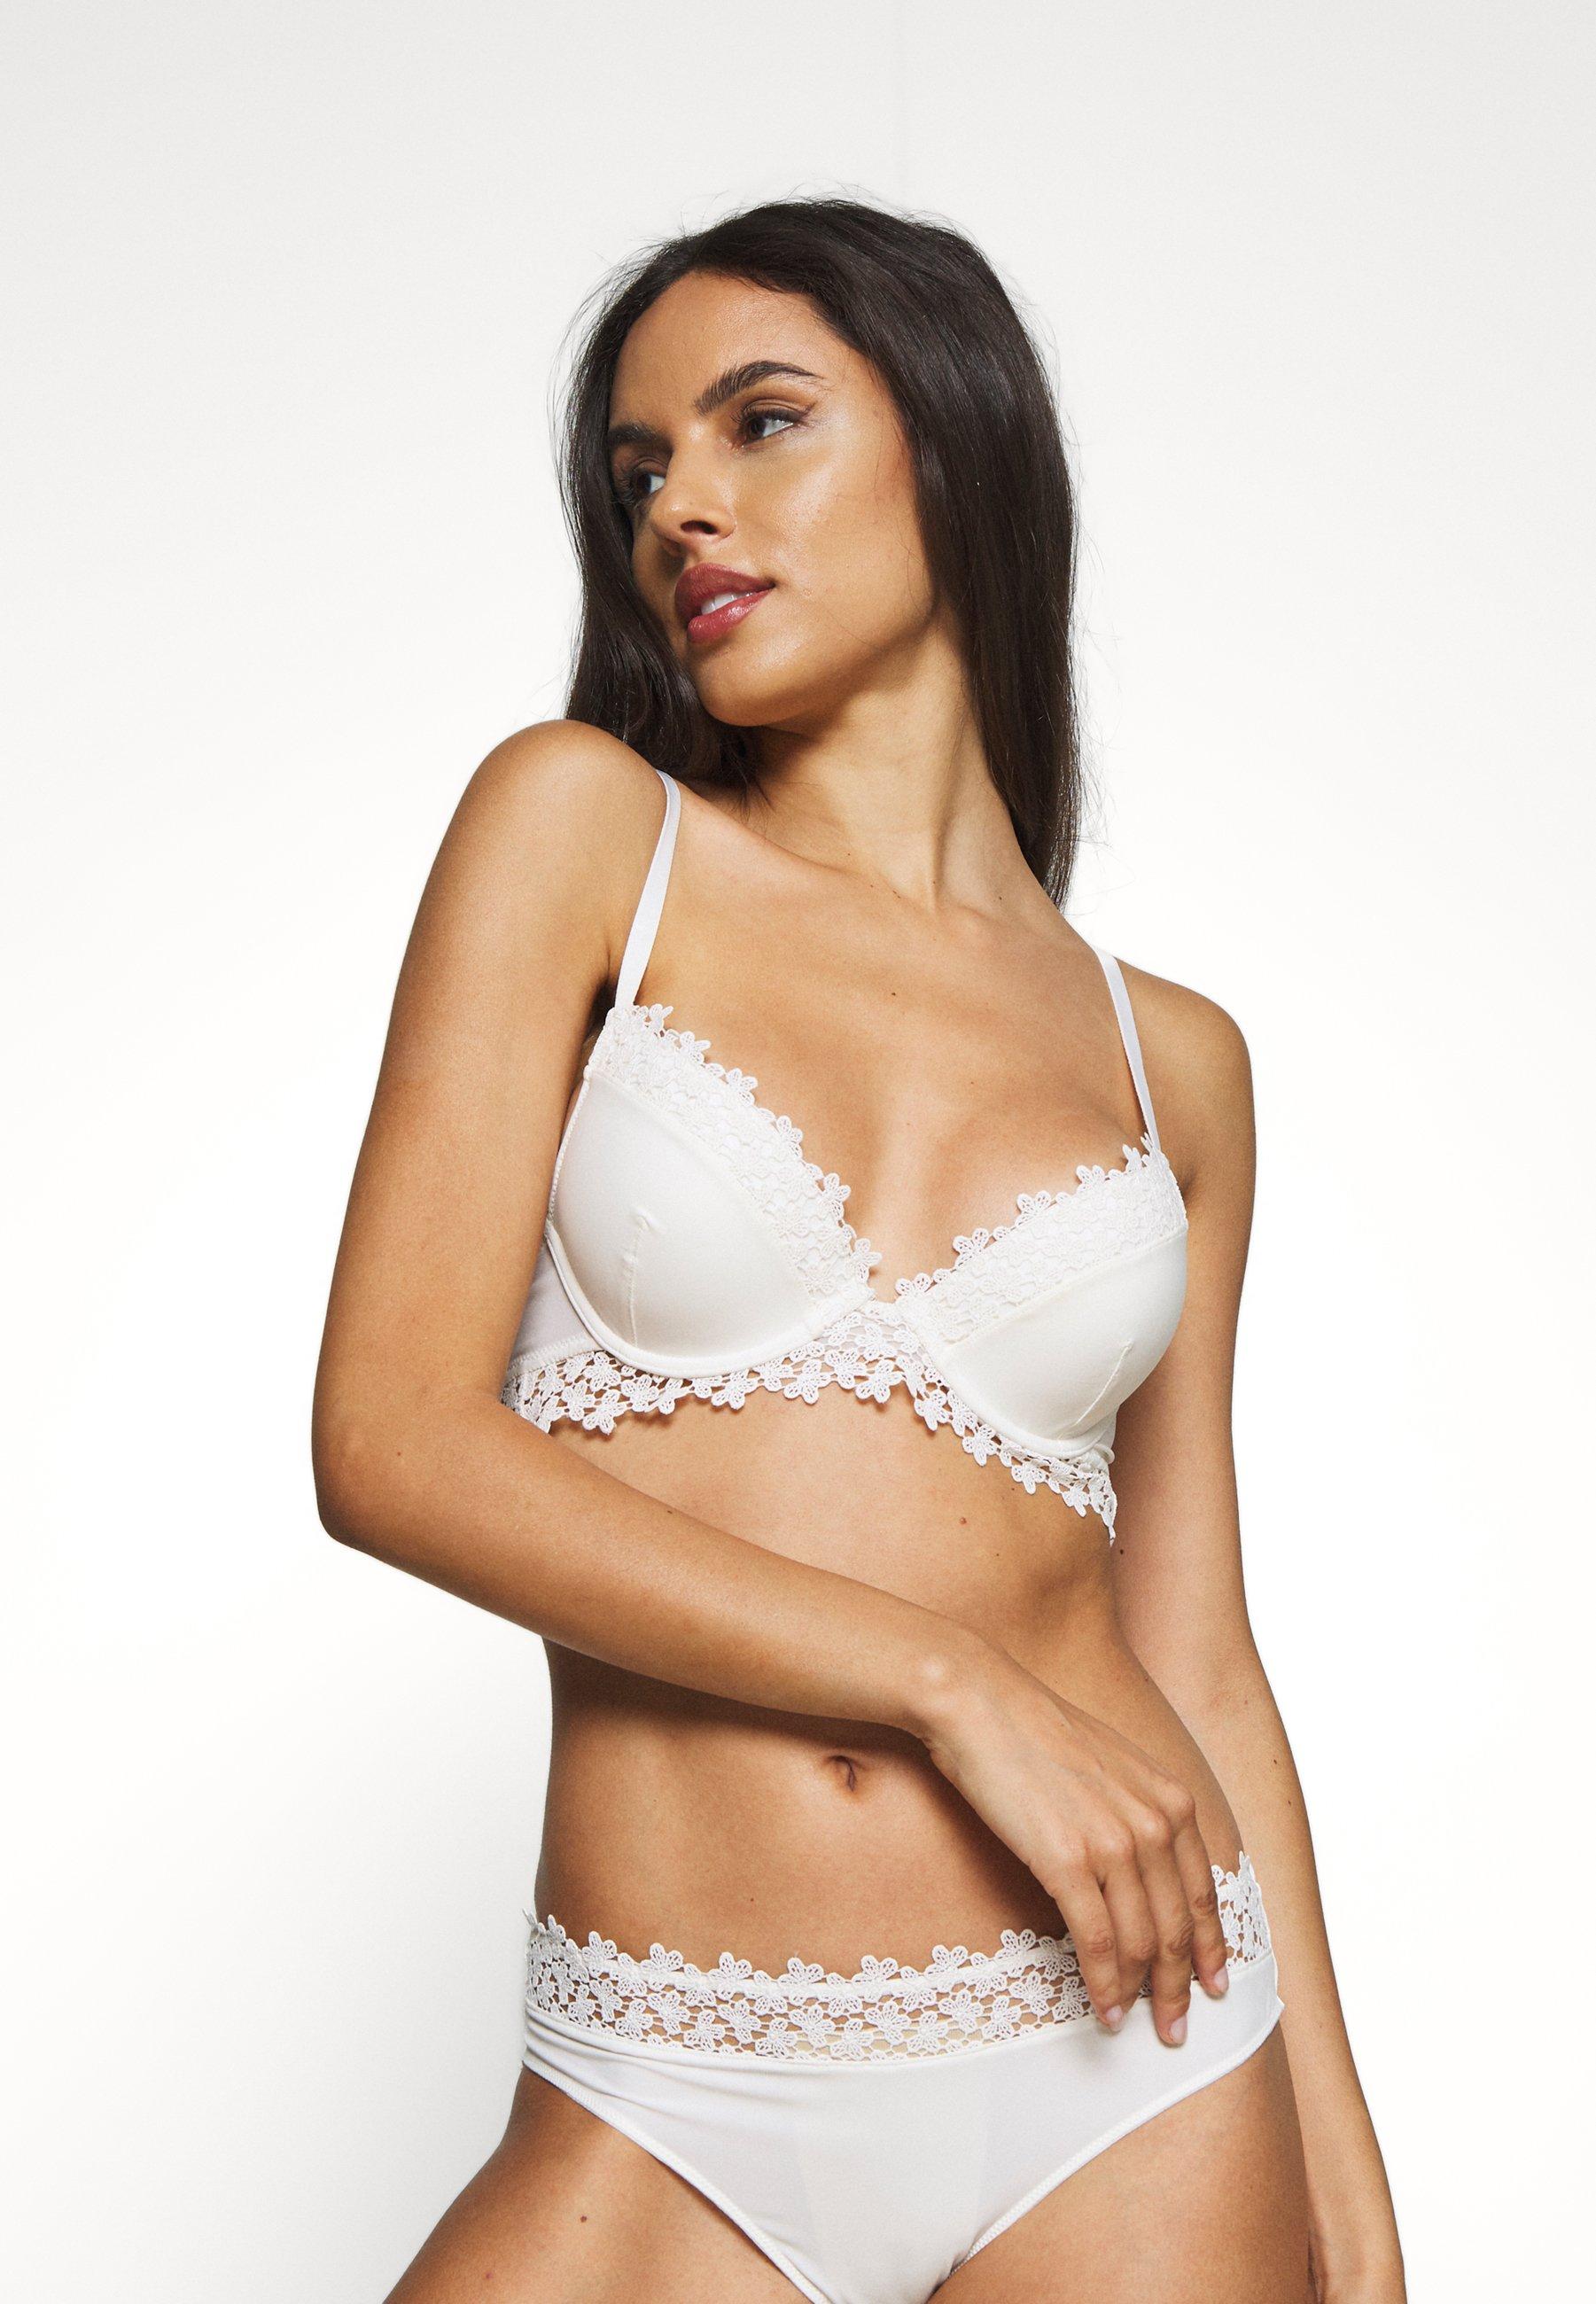 Women NYMPHEA N°2 CLASSIQUE - Triangle bra